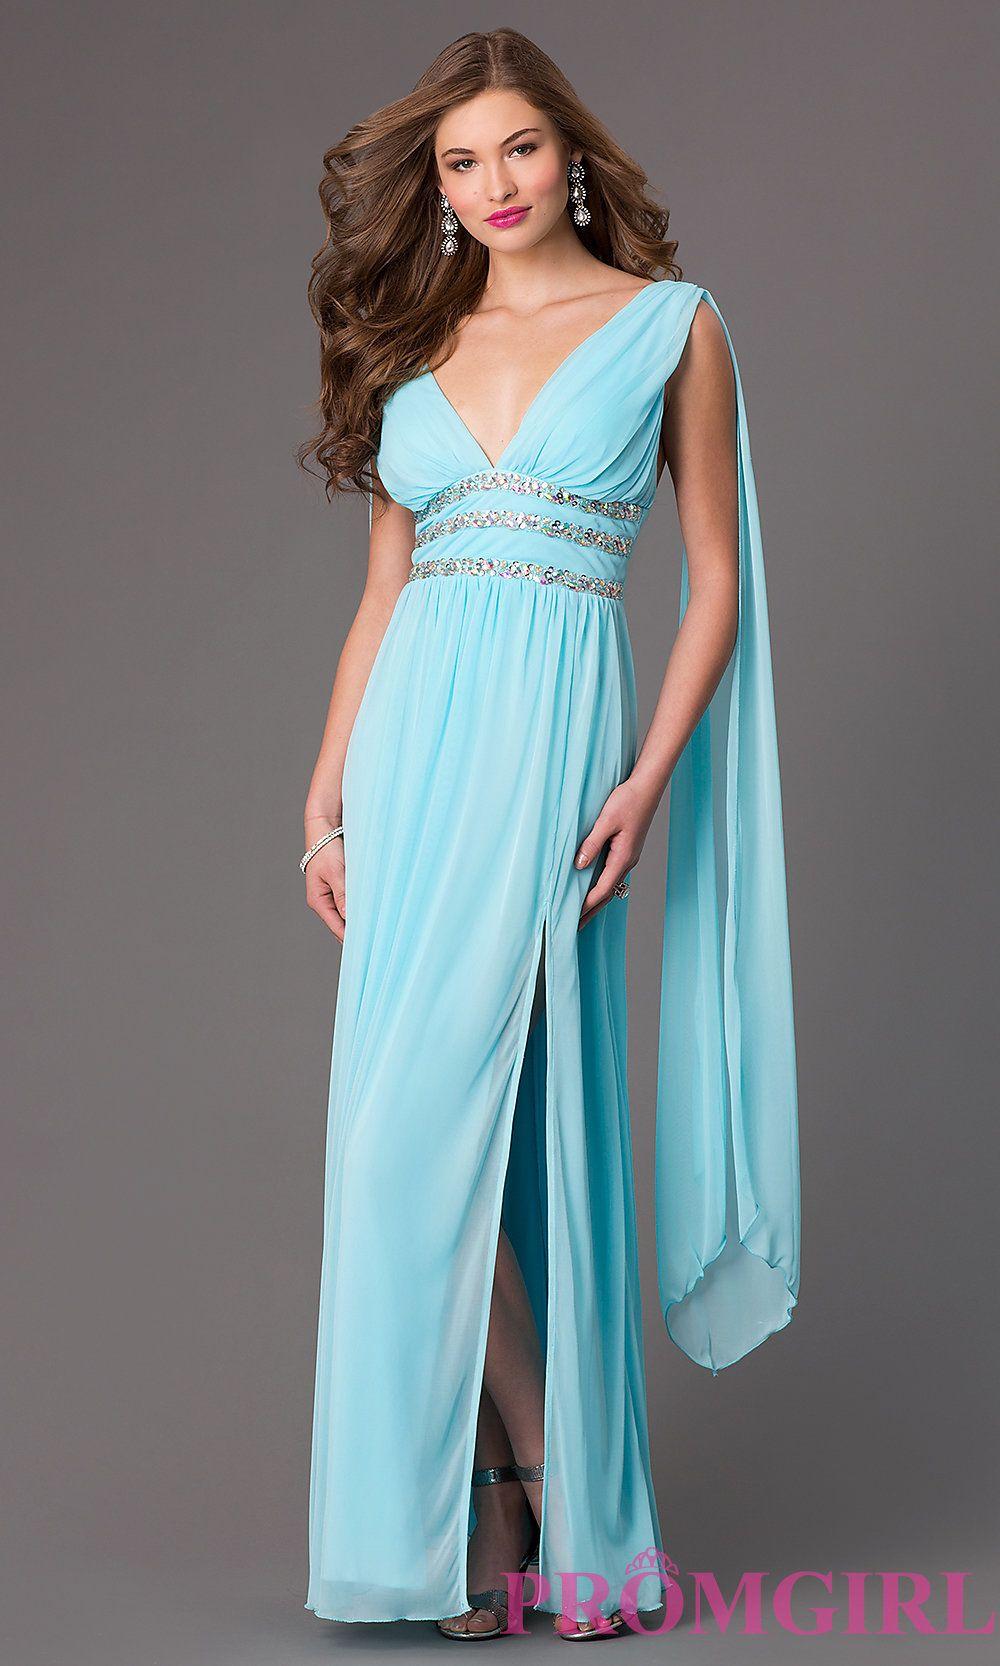 Modern Prom Dress Stores Ct Gallery - Wedding Dress Ideas ...